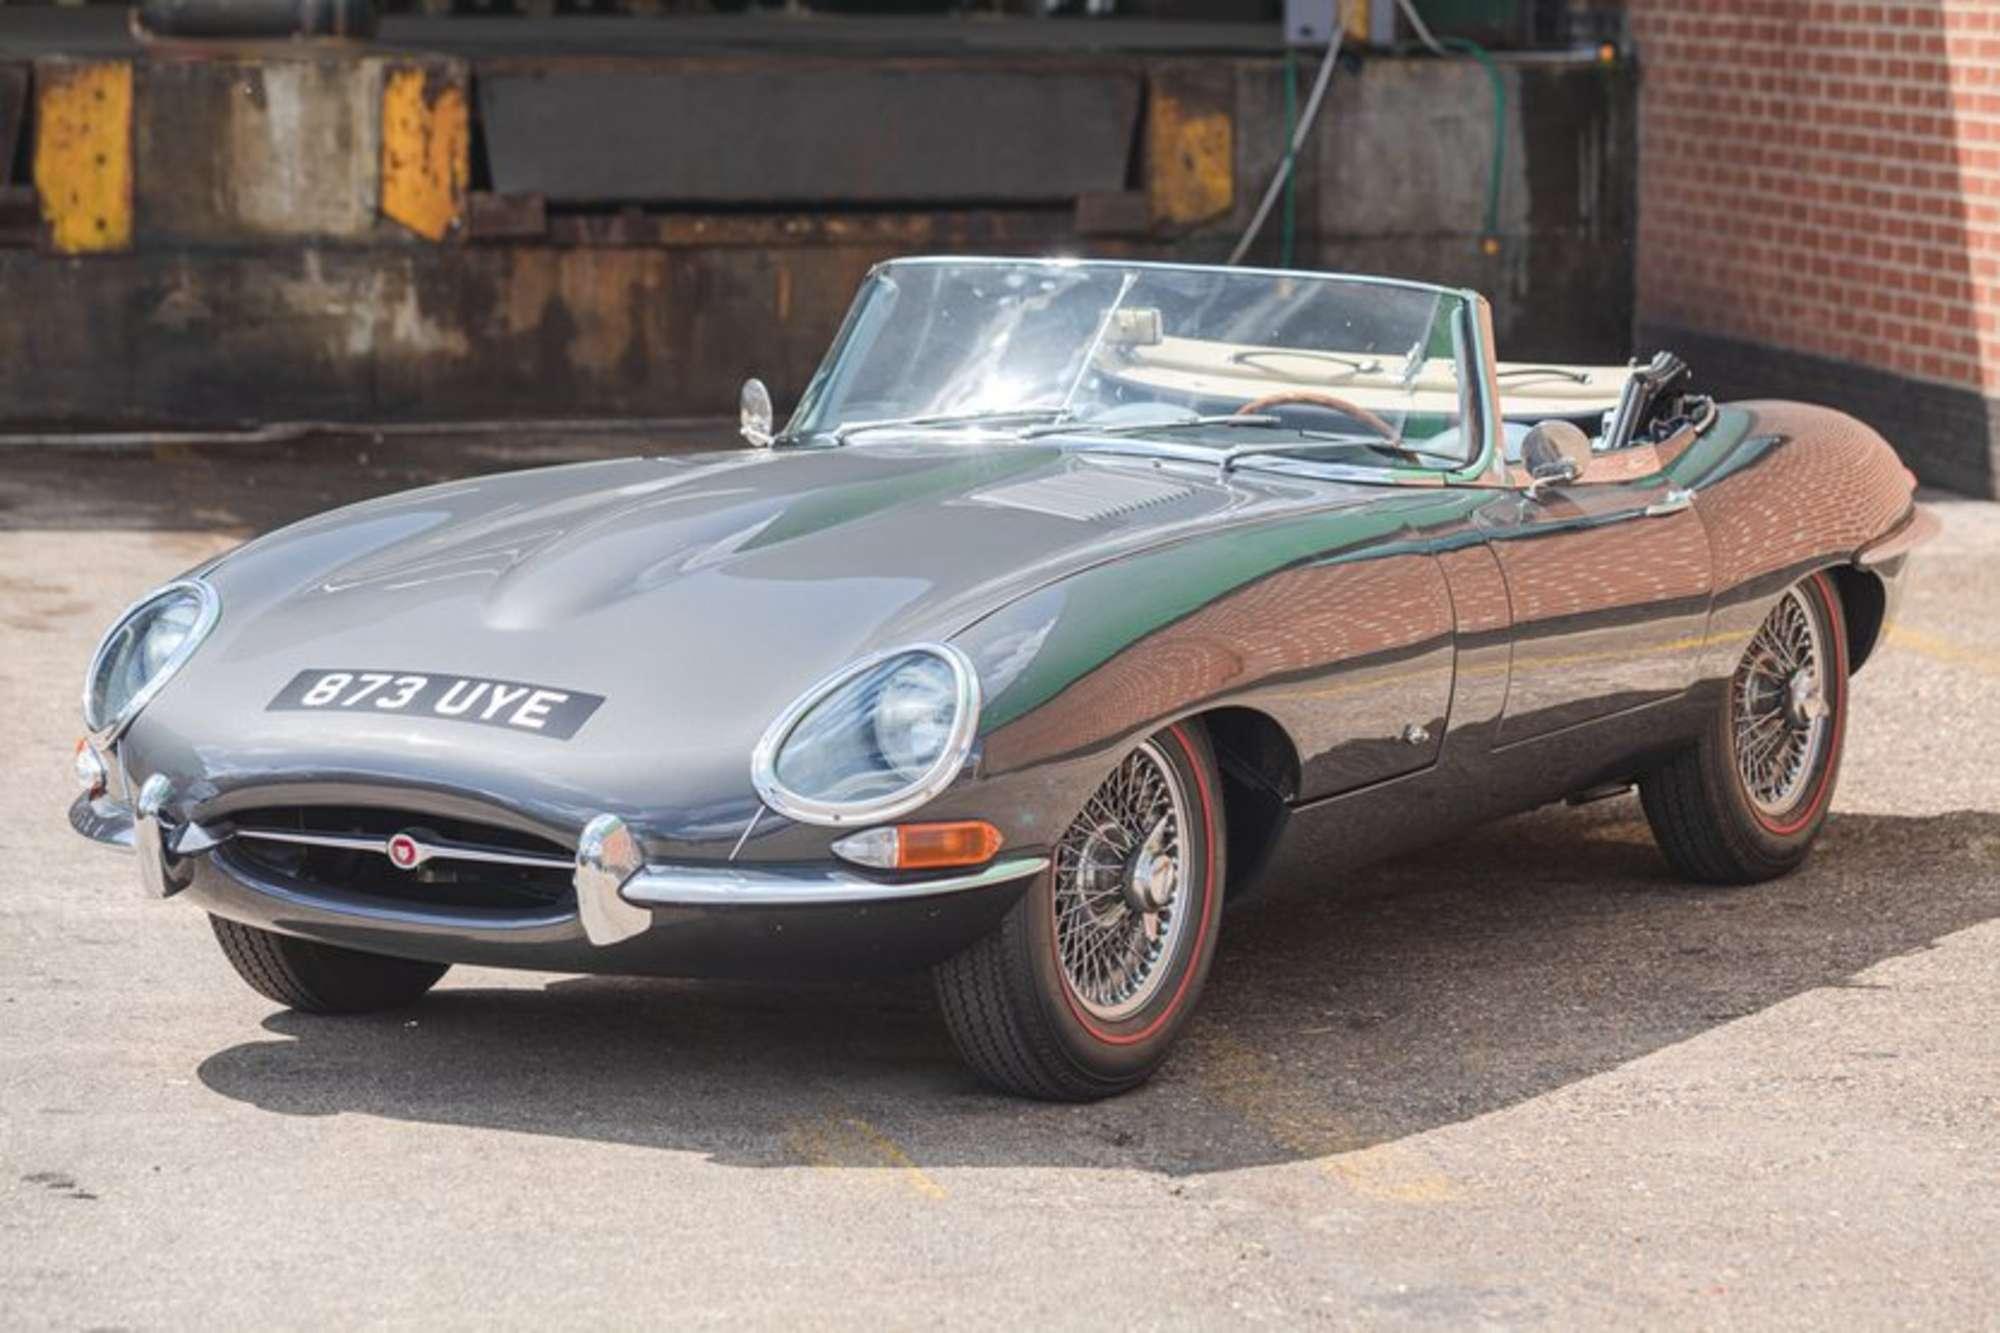 1961 Jaguar E-Type 3.8 'External Bonnet Lock' Roadster